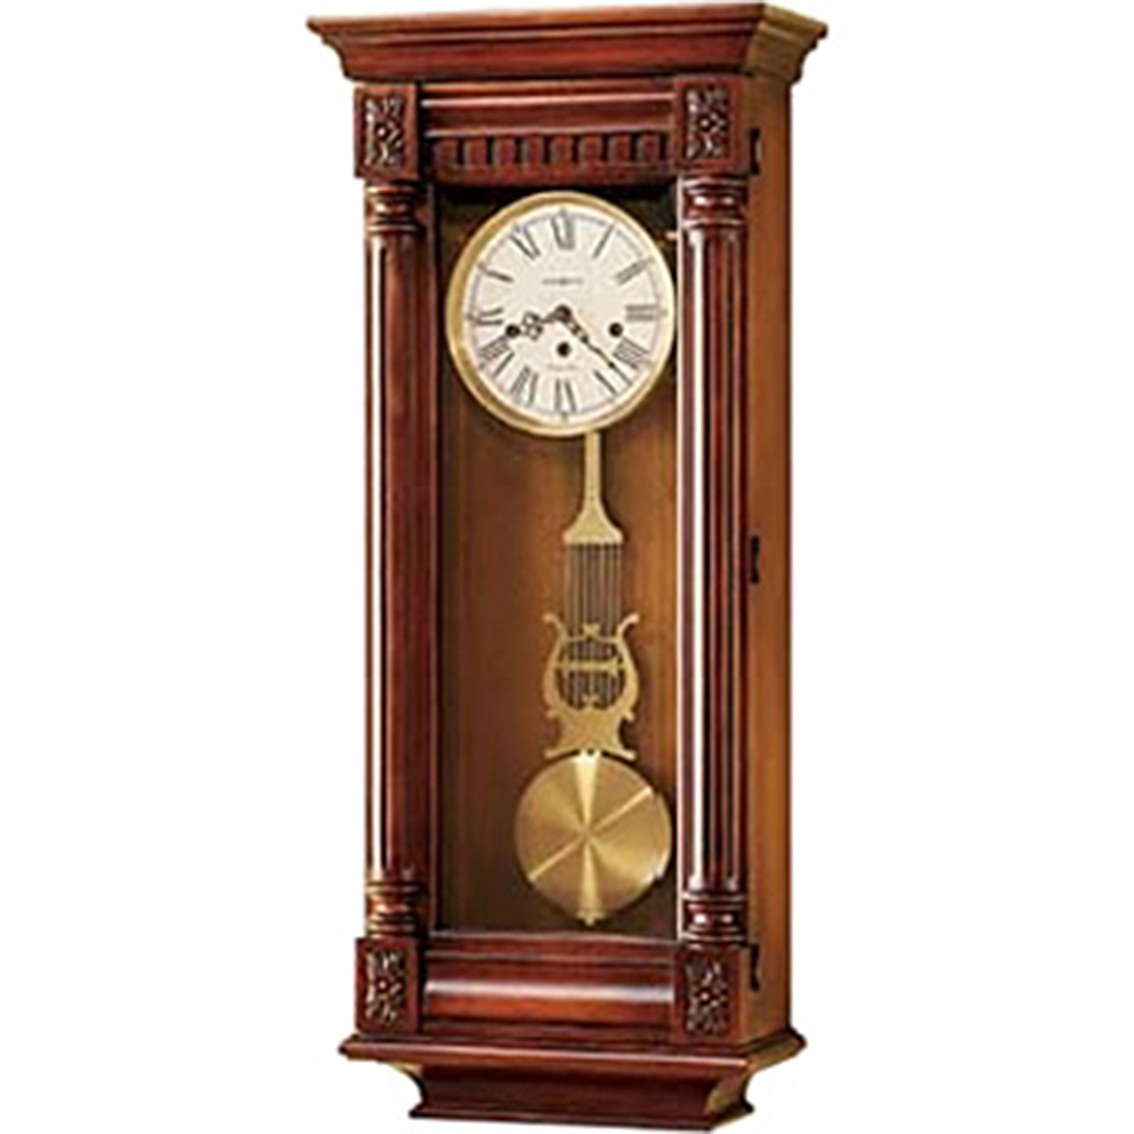 howard miller wall clock Howard Miller New Haven Wall Clock | Clocks | Home & Appliances  howard miller wall clock